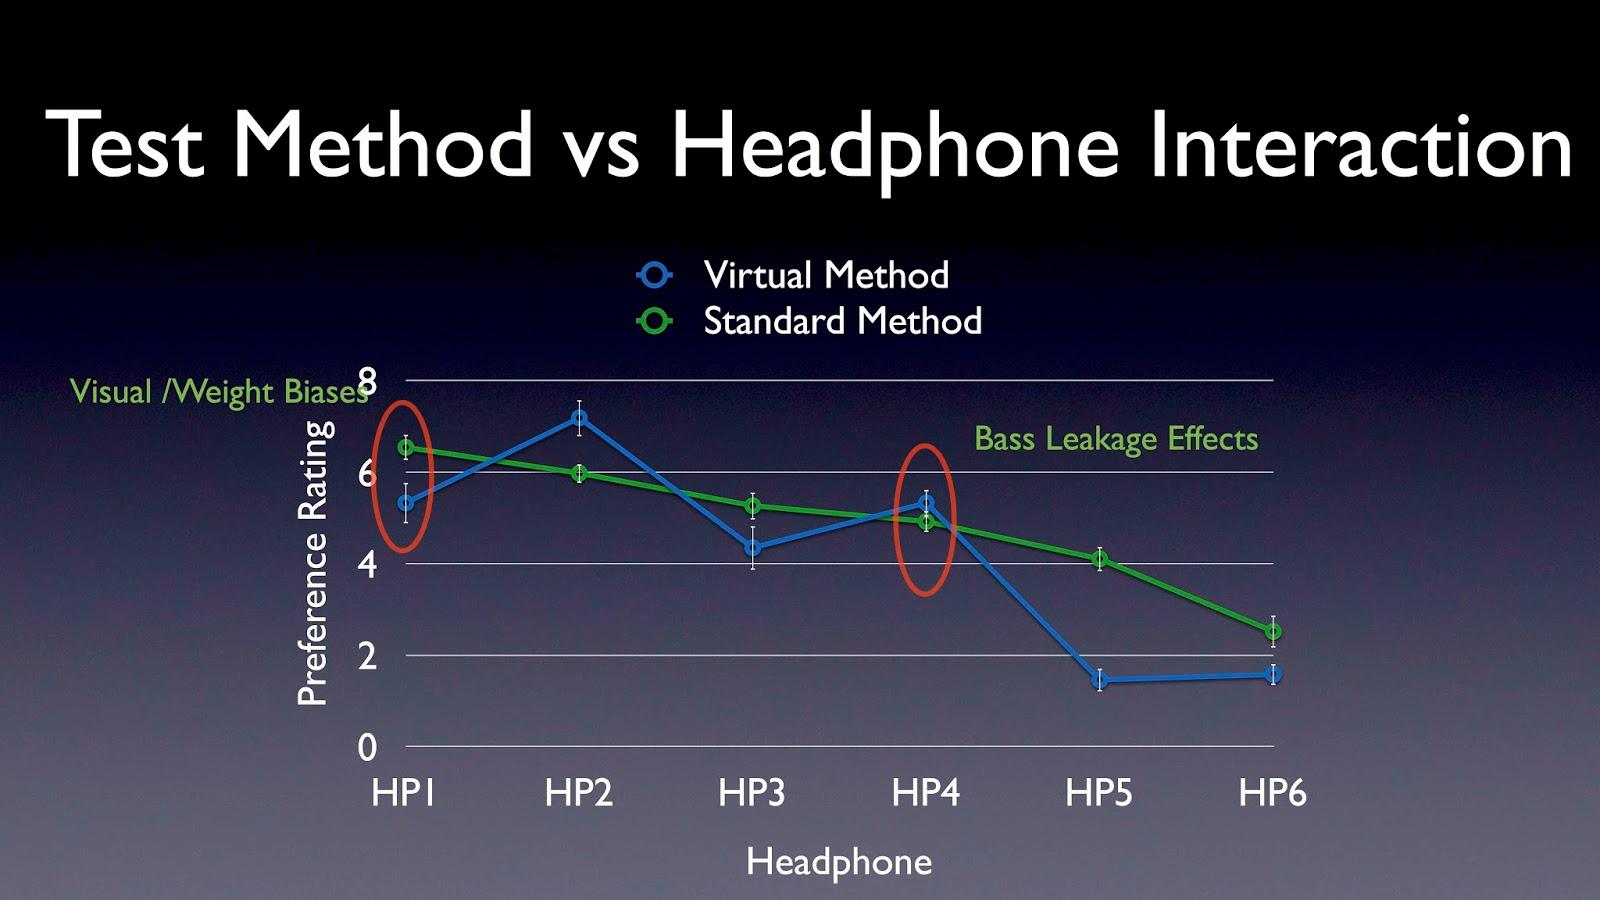 Audio Musings by Sean Olive: A Virtual Headphone Listening Test Method